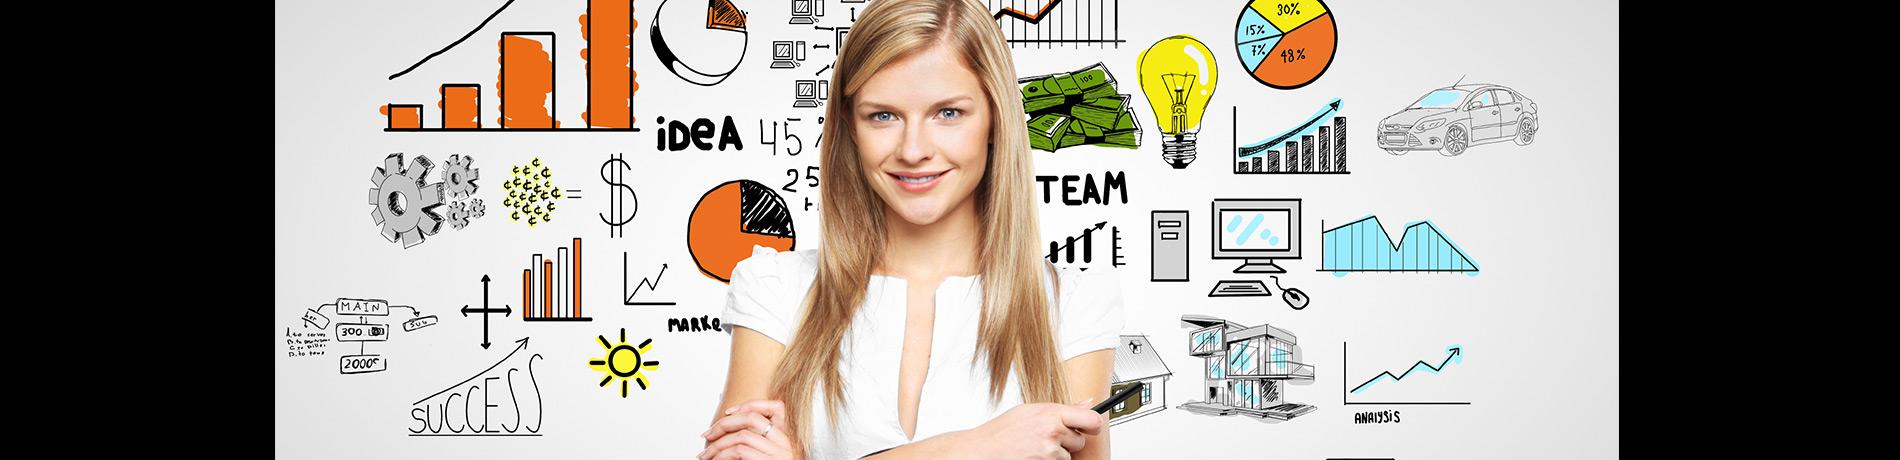 RSA Marketing Canada marketing services ideas